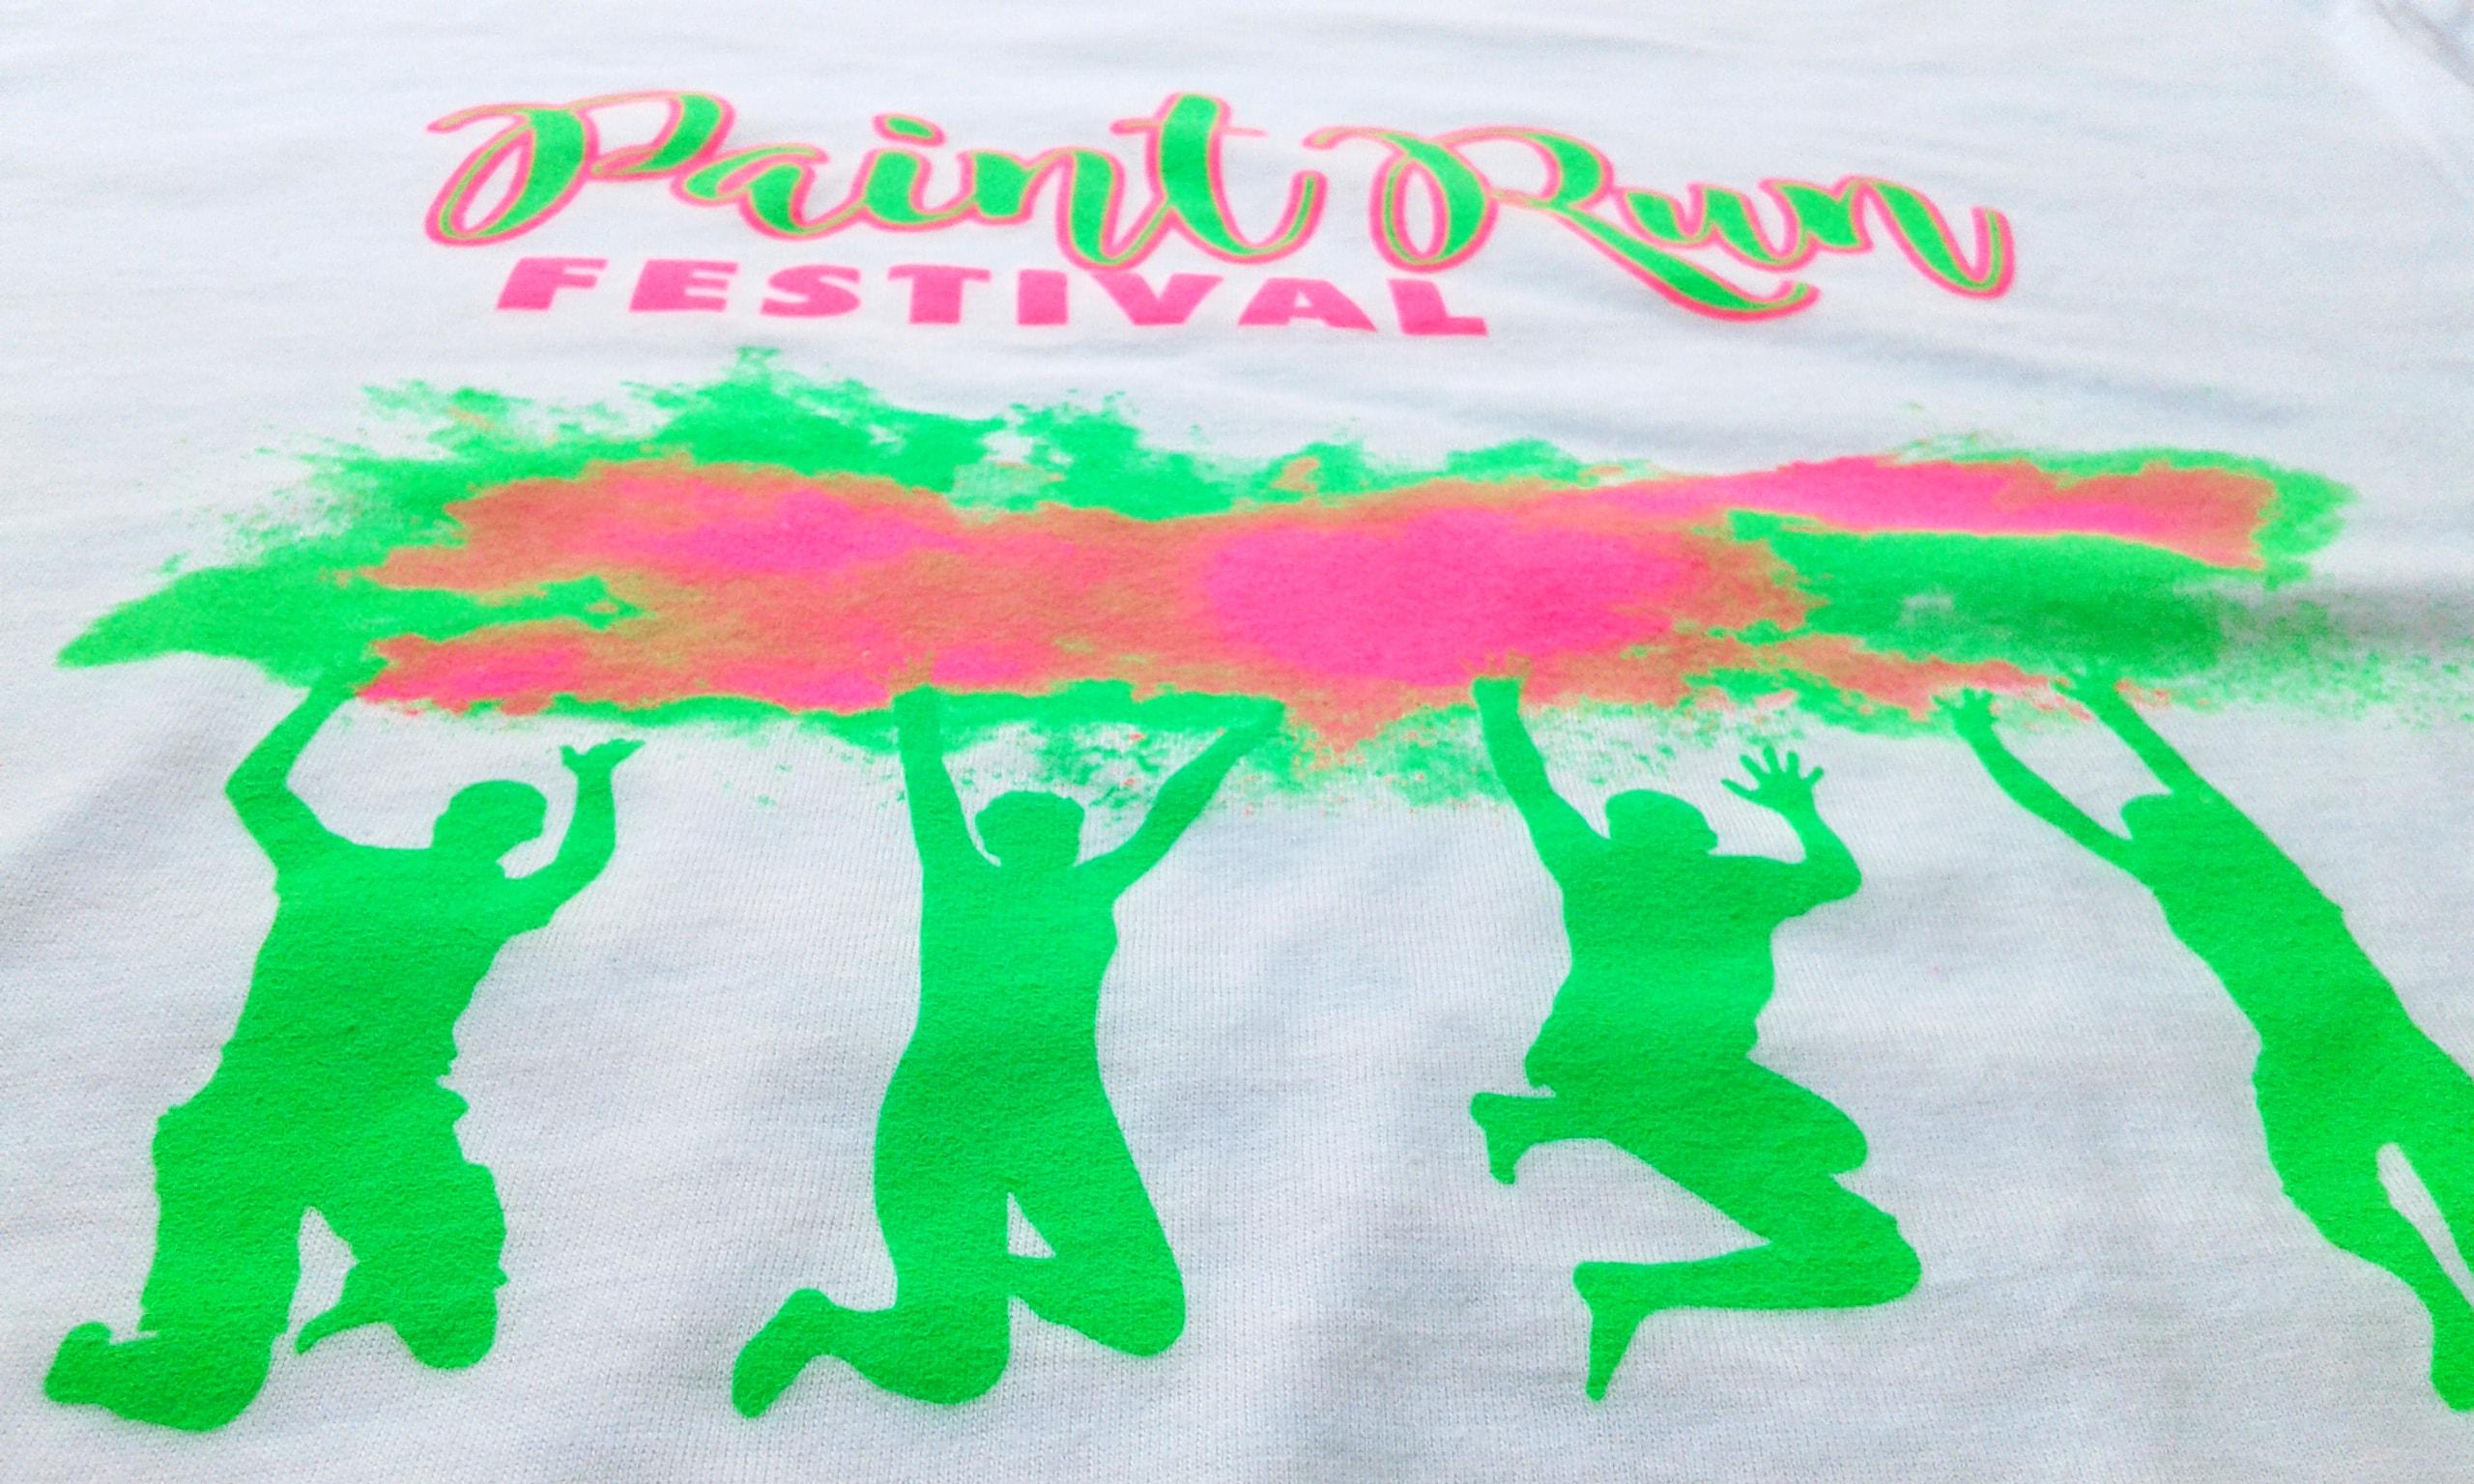 Paint Run Festival